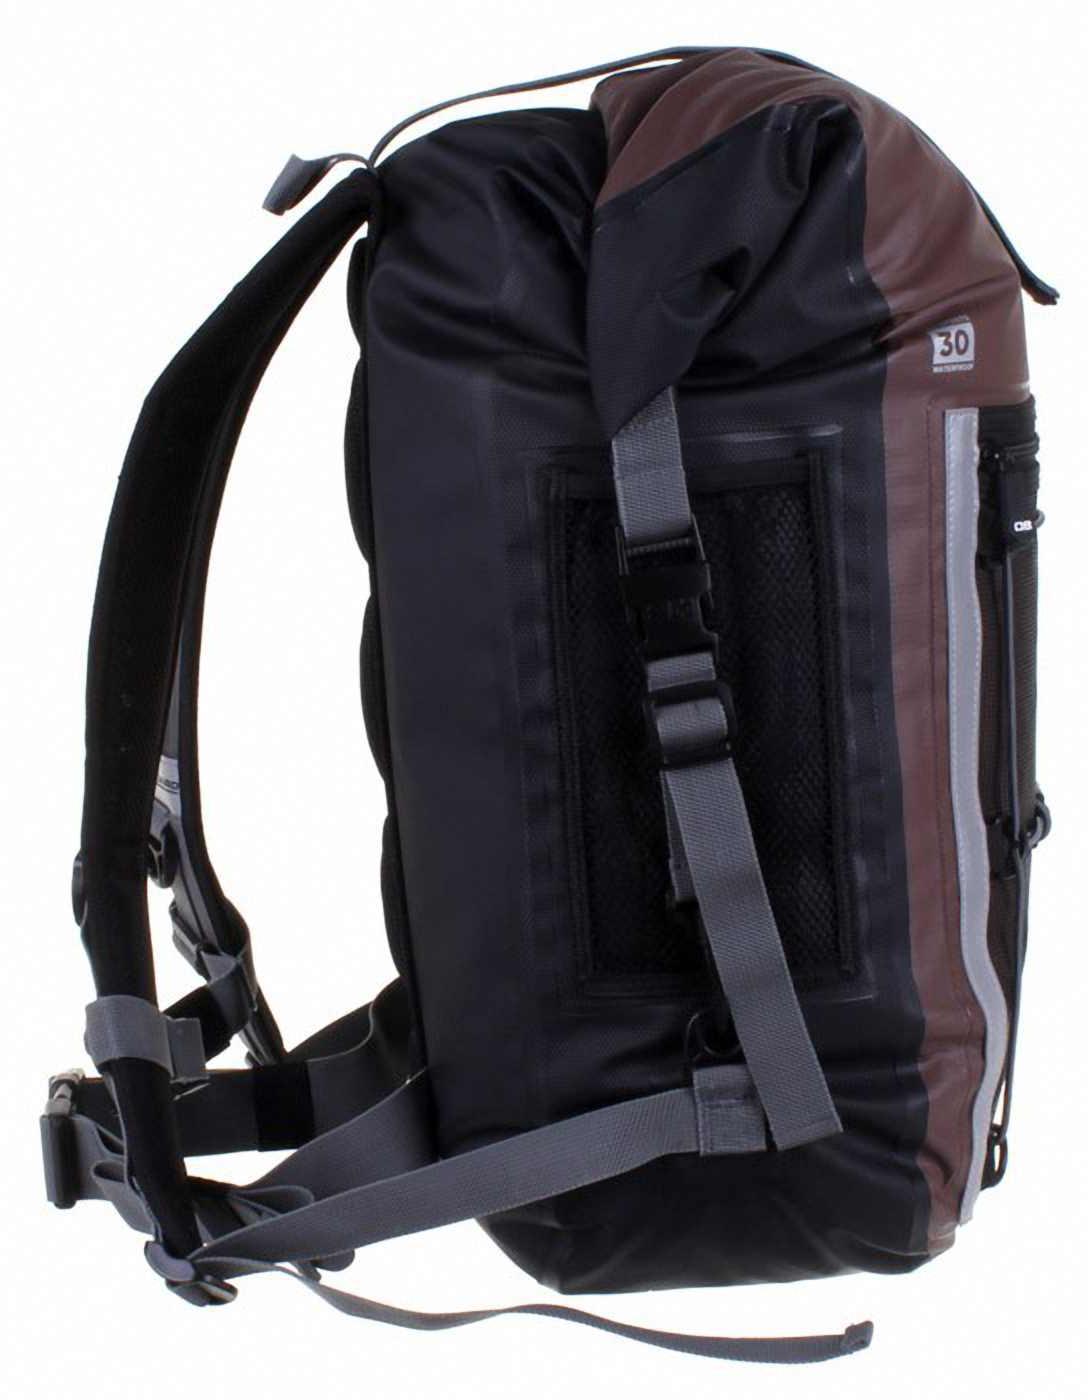 68c4f8fcdb Overboard Pro Sports Waterproof Backpack- Fenix Toulouse Handball